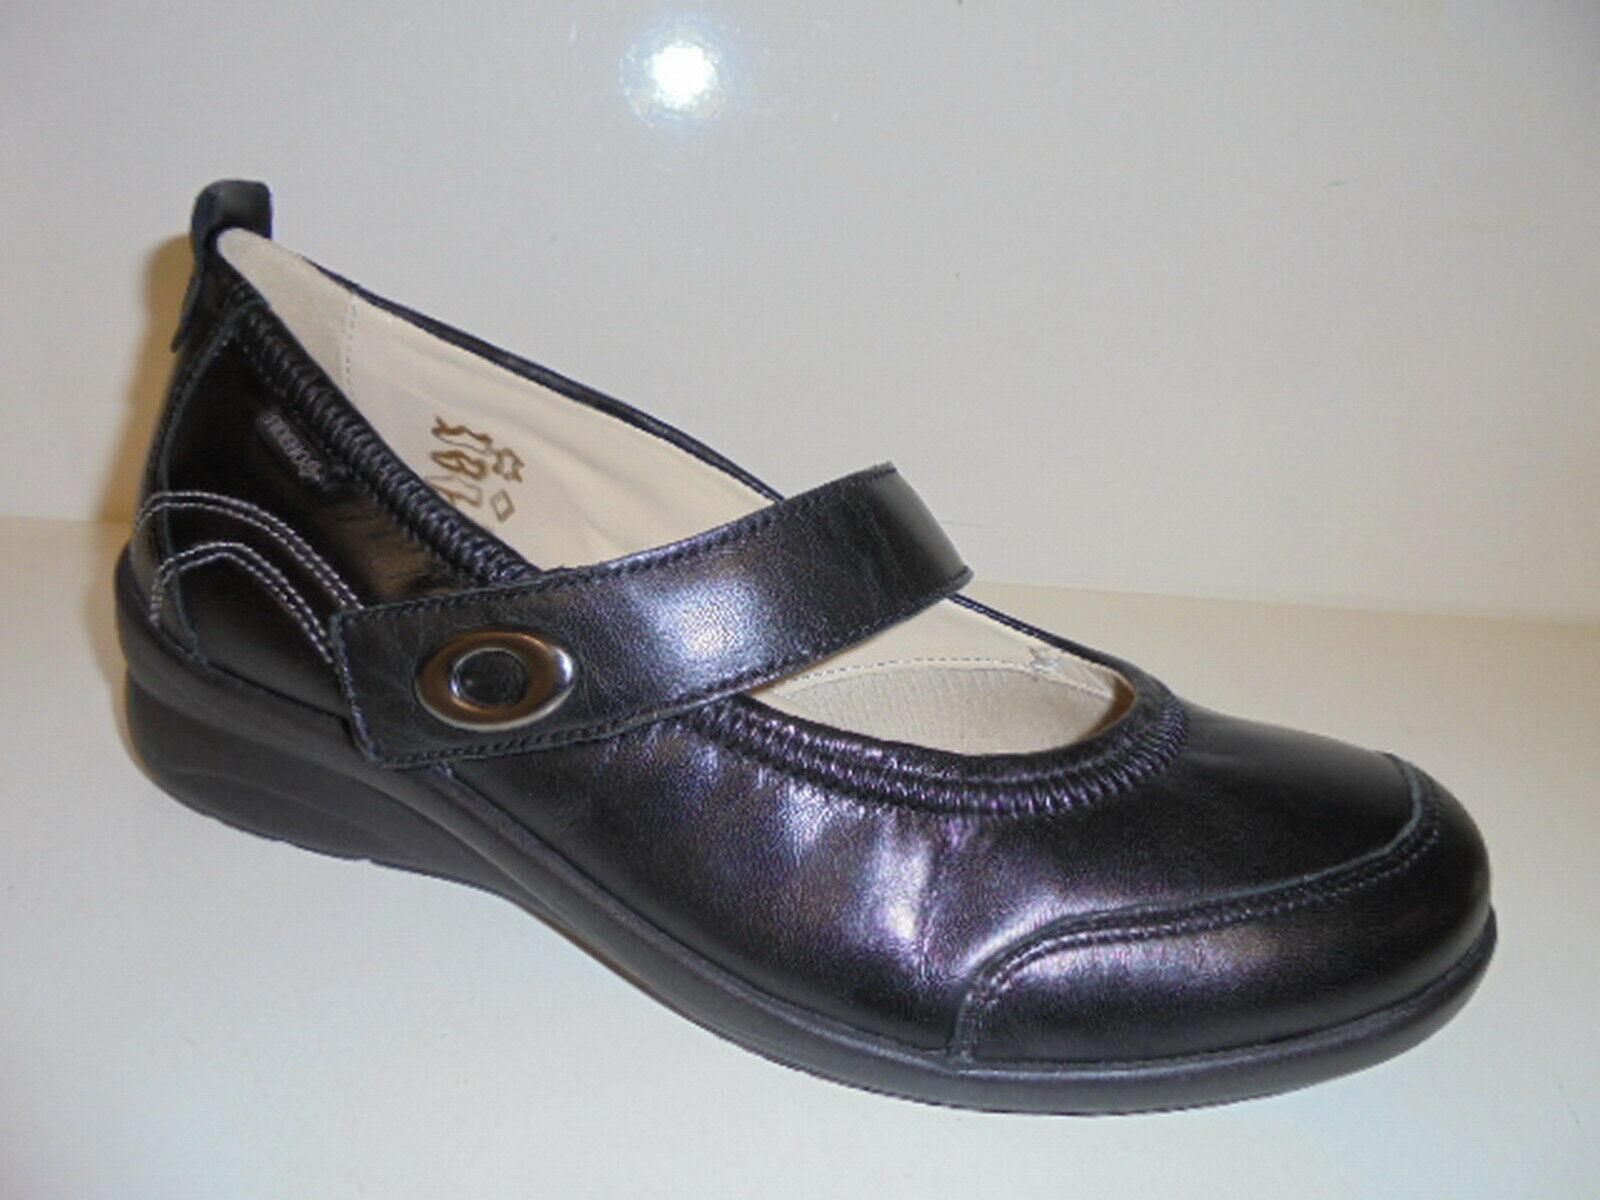 356006 Fidelio Damenschuhe Ballerina Leder schwarz UK 8½ Grösse 42,5